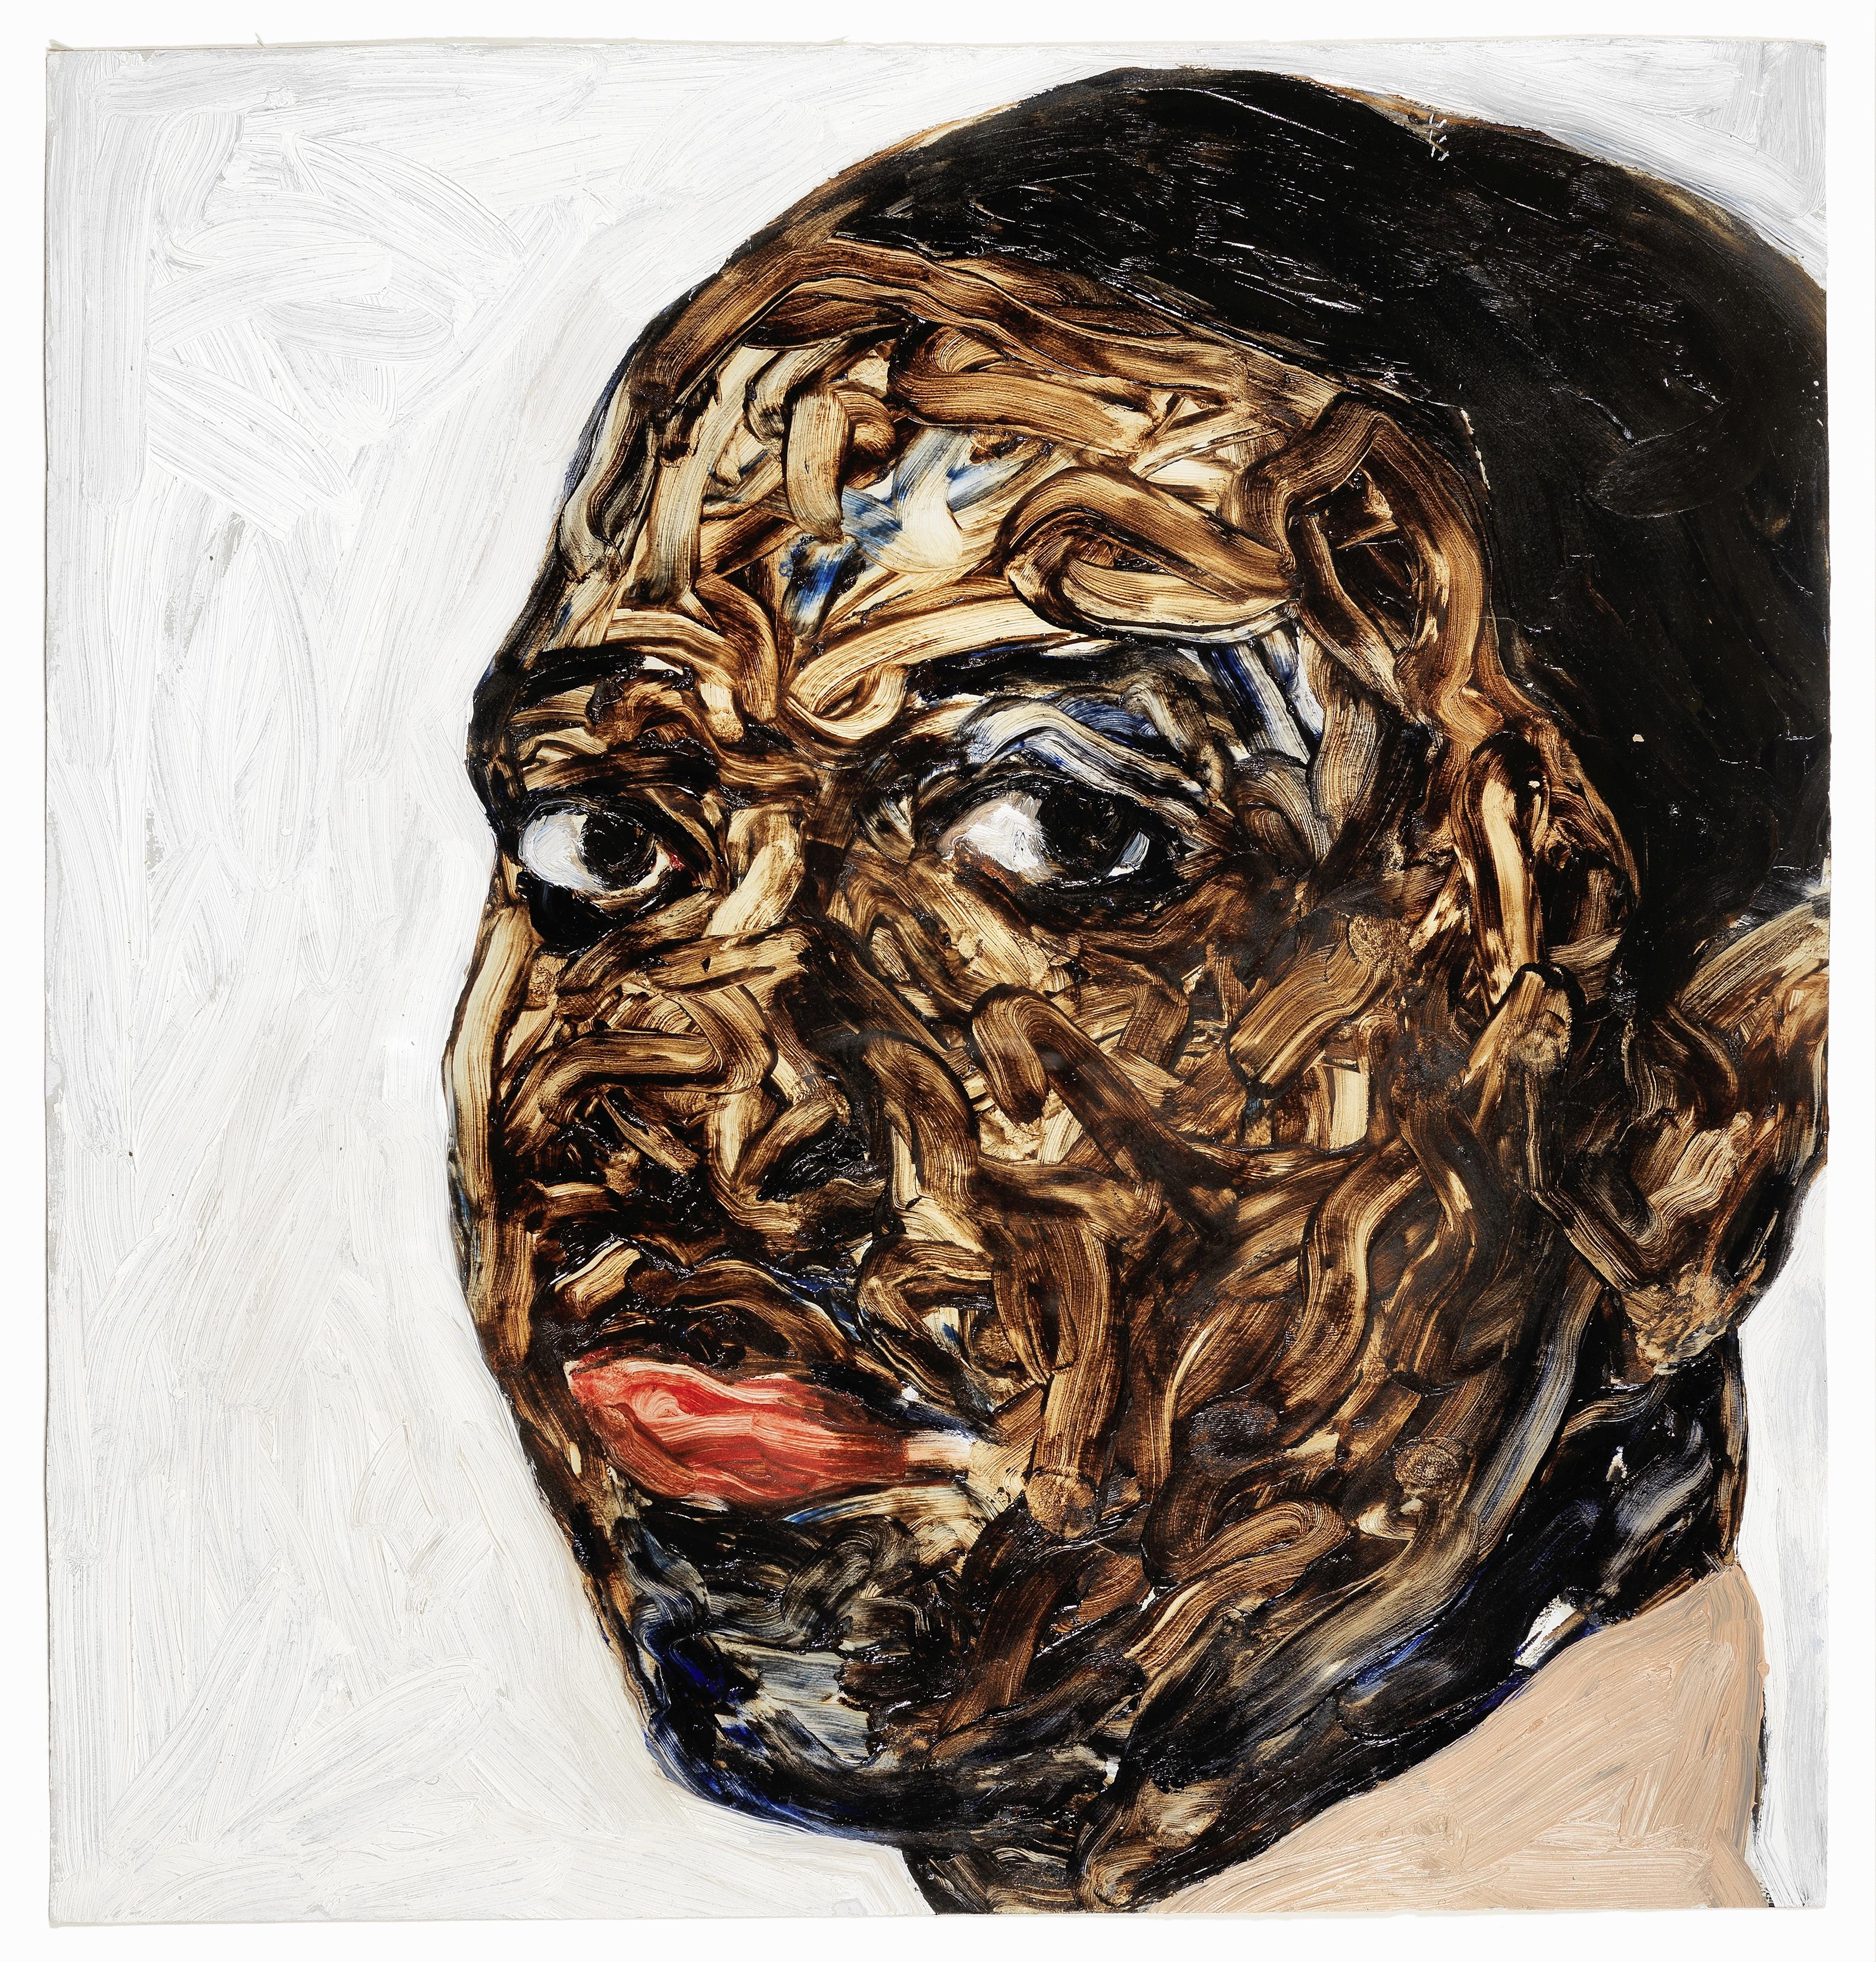 Lot 2 - Amoako Boafo (B. 1984) Portrait of a young man, 2018